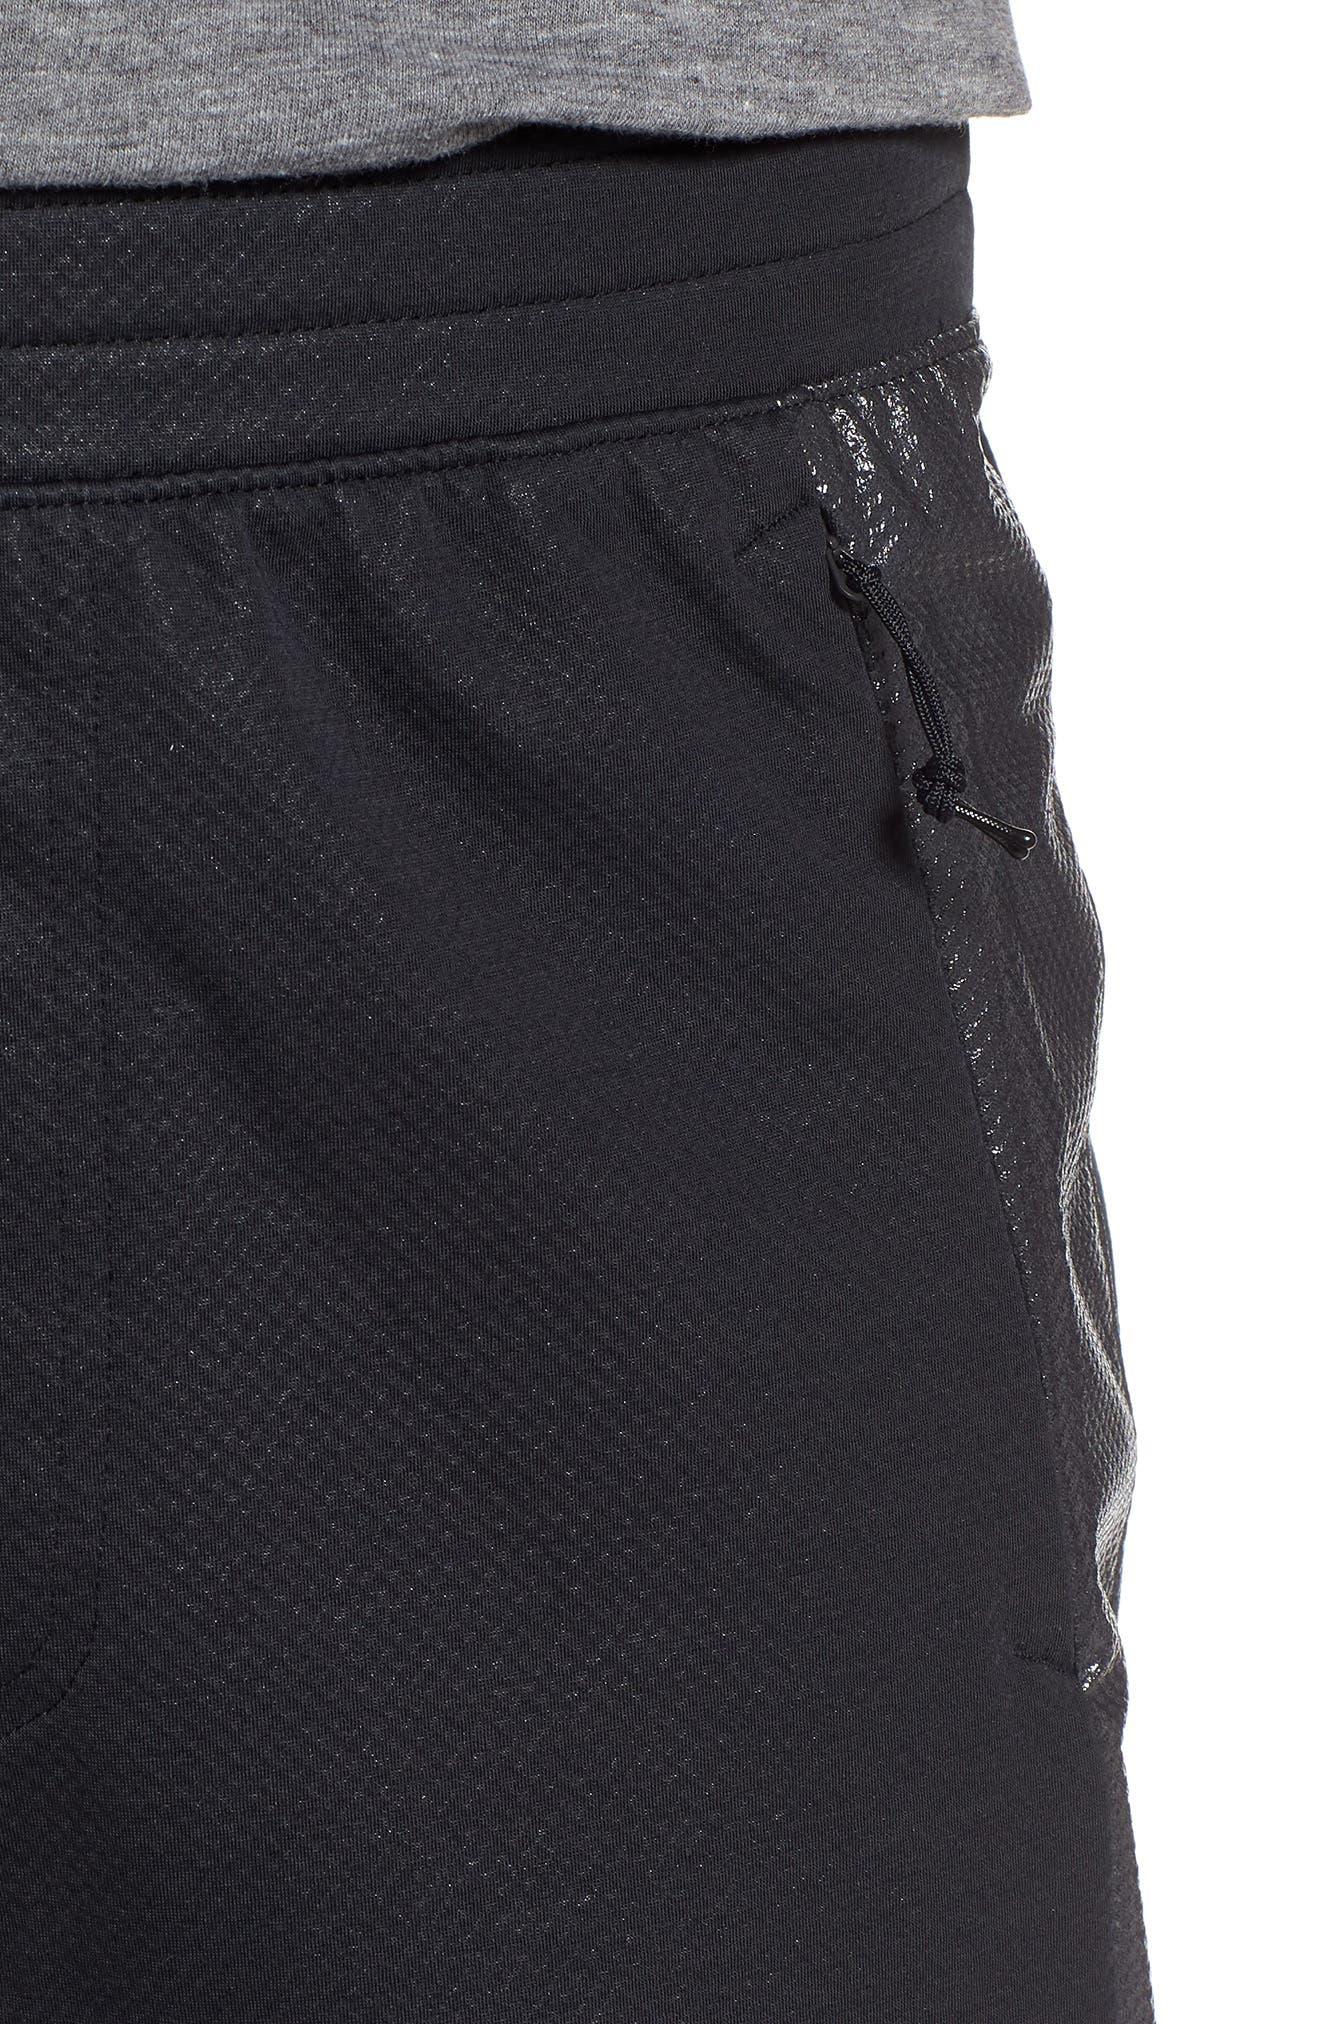 ,                             Unstoppable Swacket Training Pants,                             Alternate thumbnail 4, color,                             BLACK FULL HEATHER/ BLACK